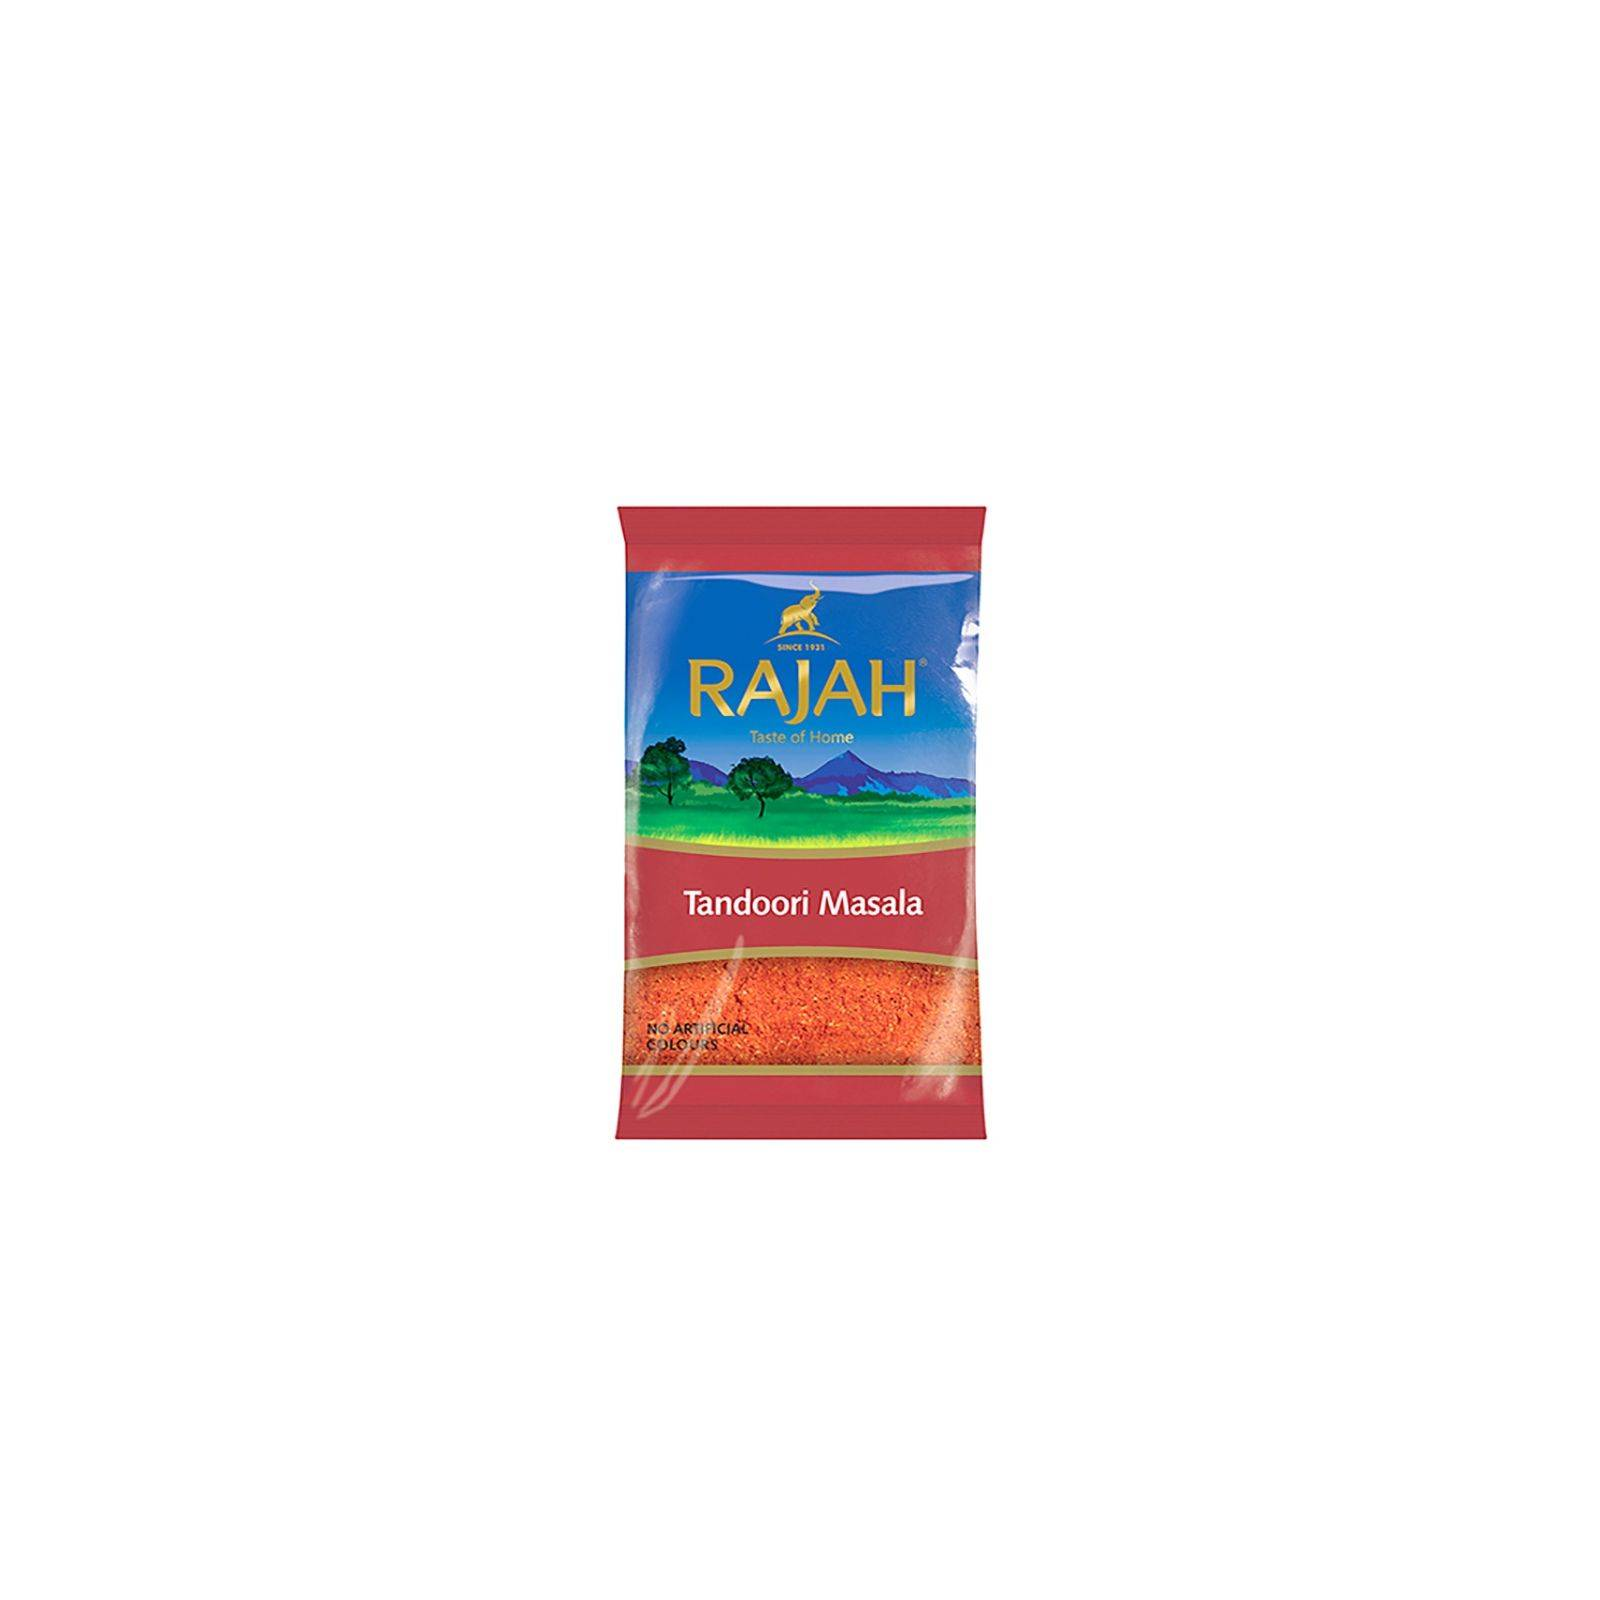 Asia Marché Tandoori Massala 100g Rajah